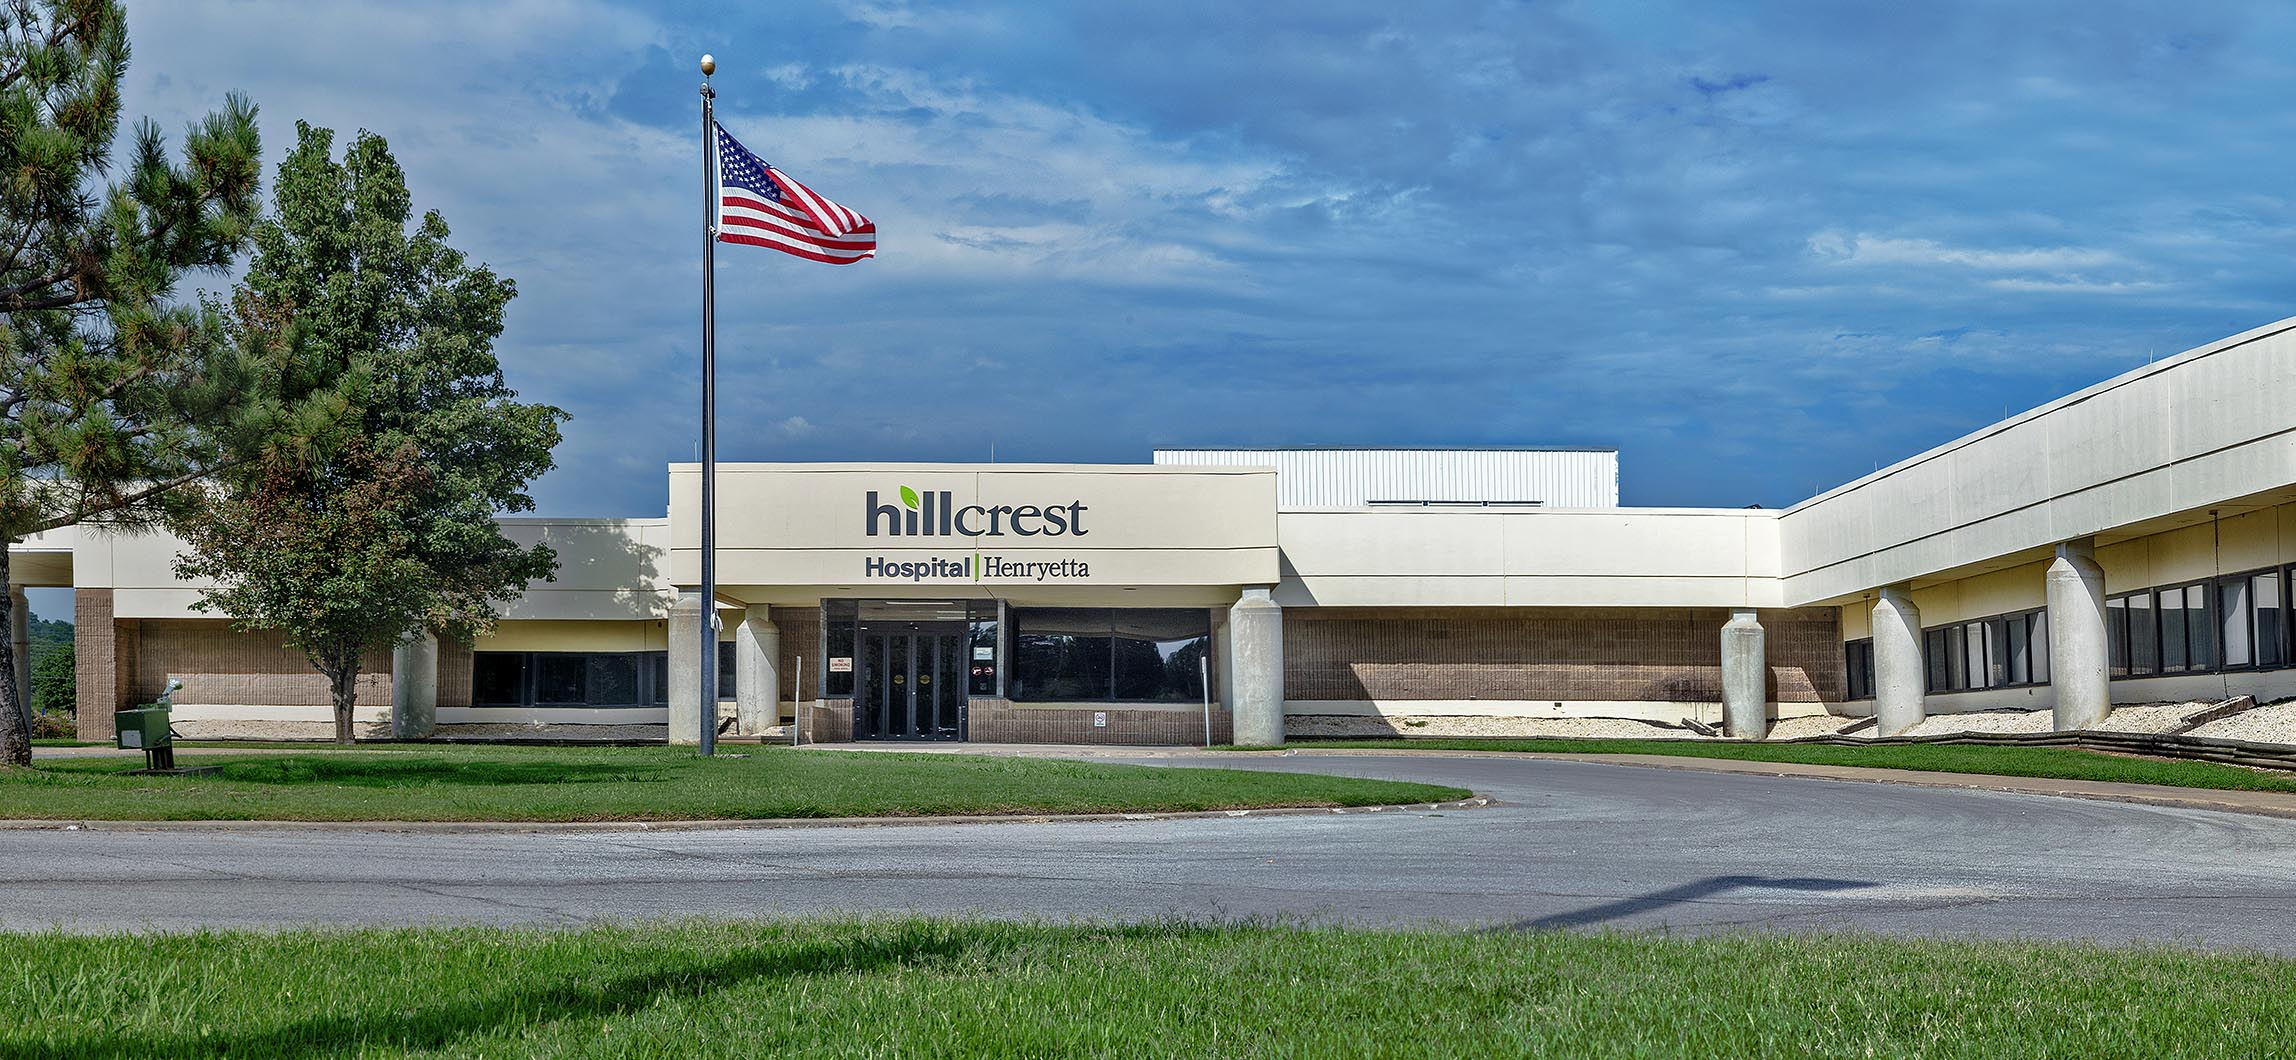 Hillcrest Hospital Henryetta